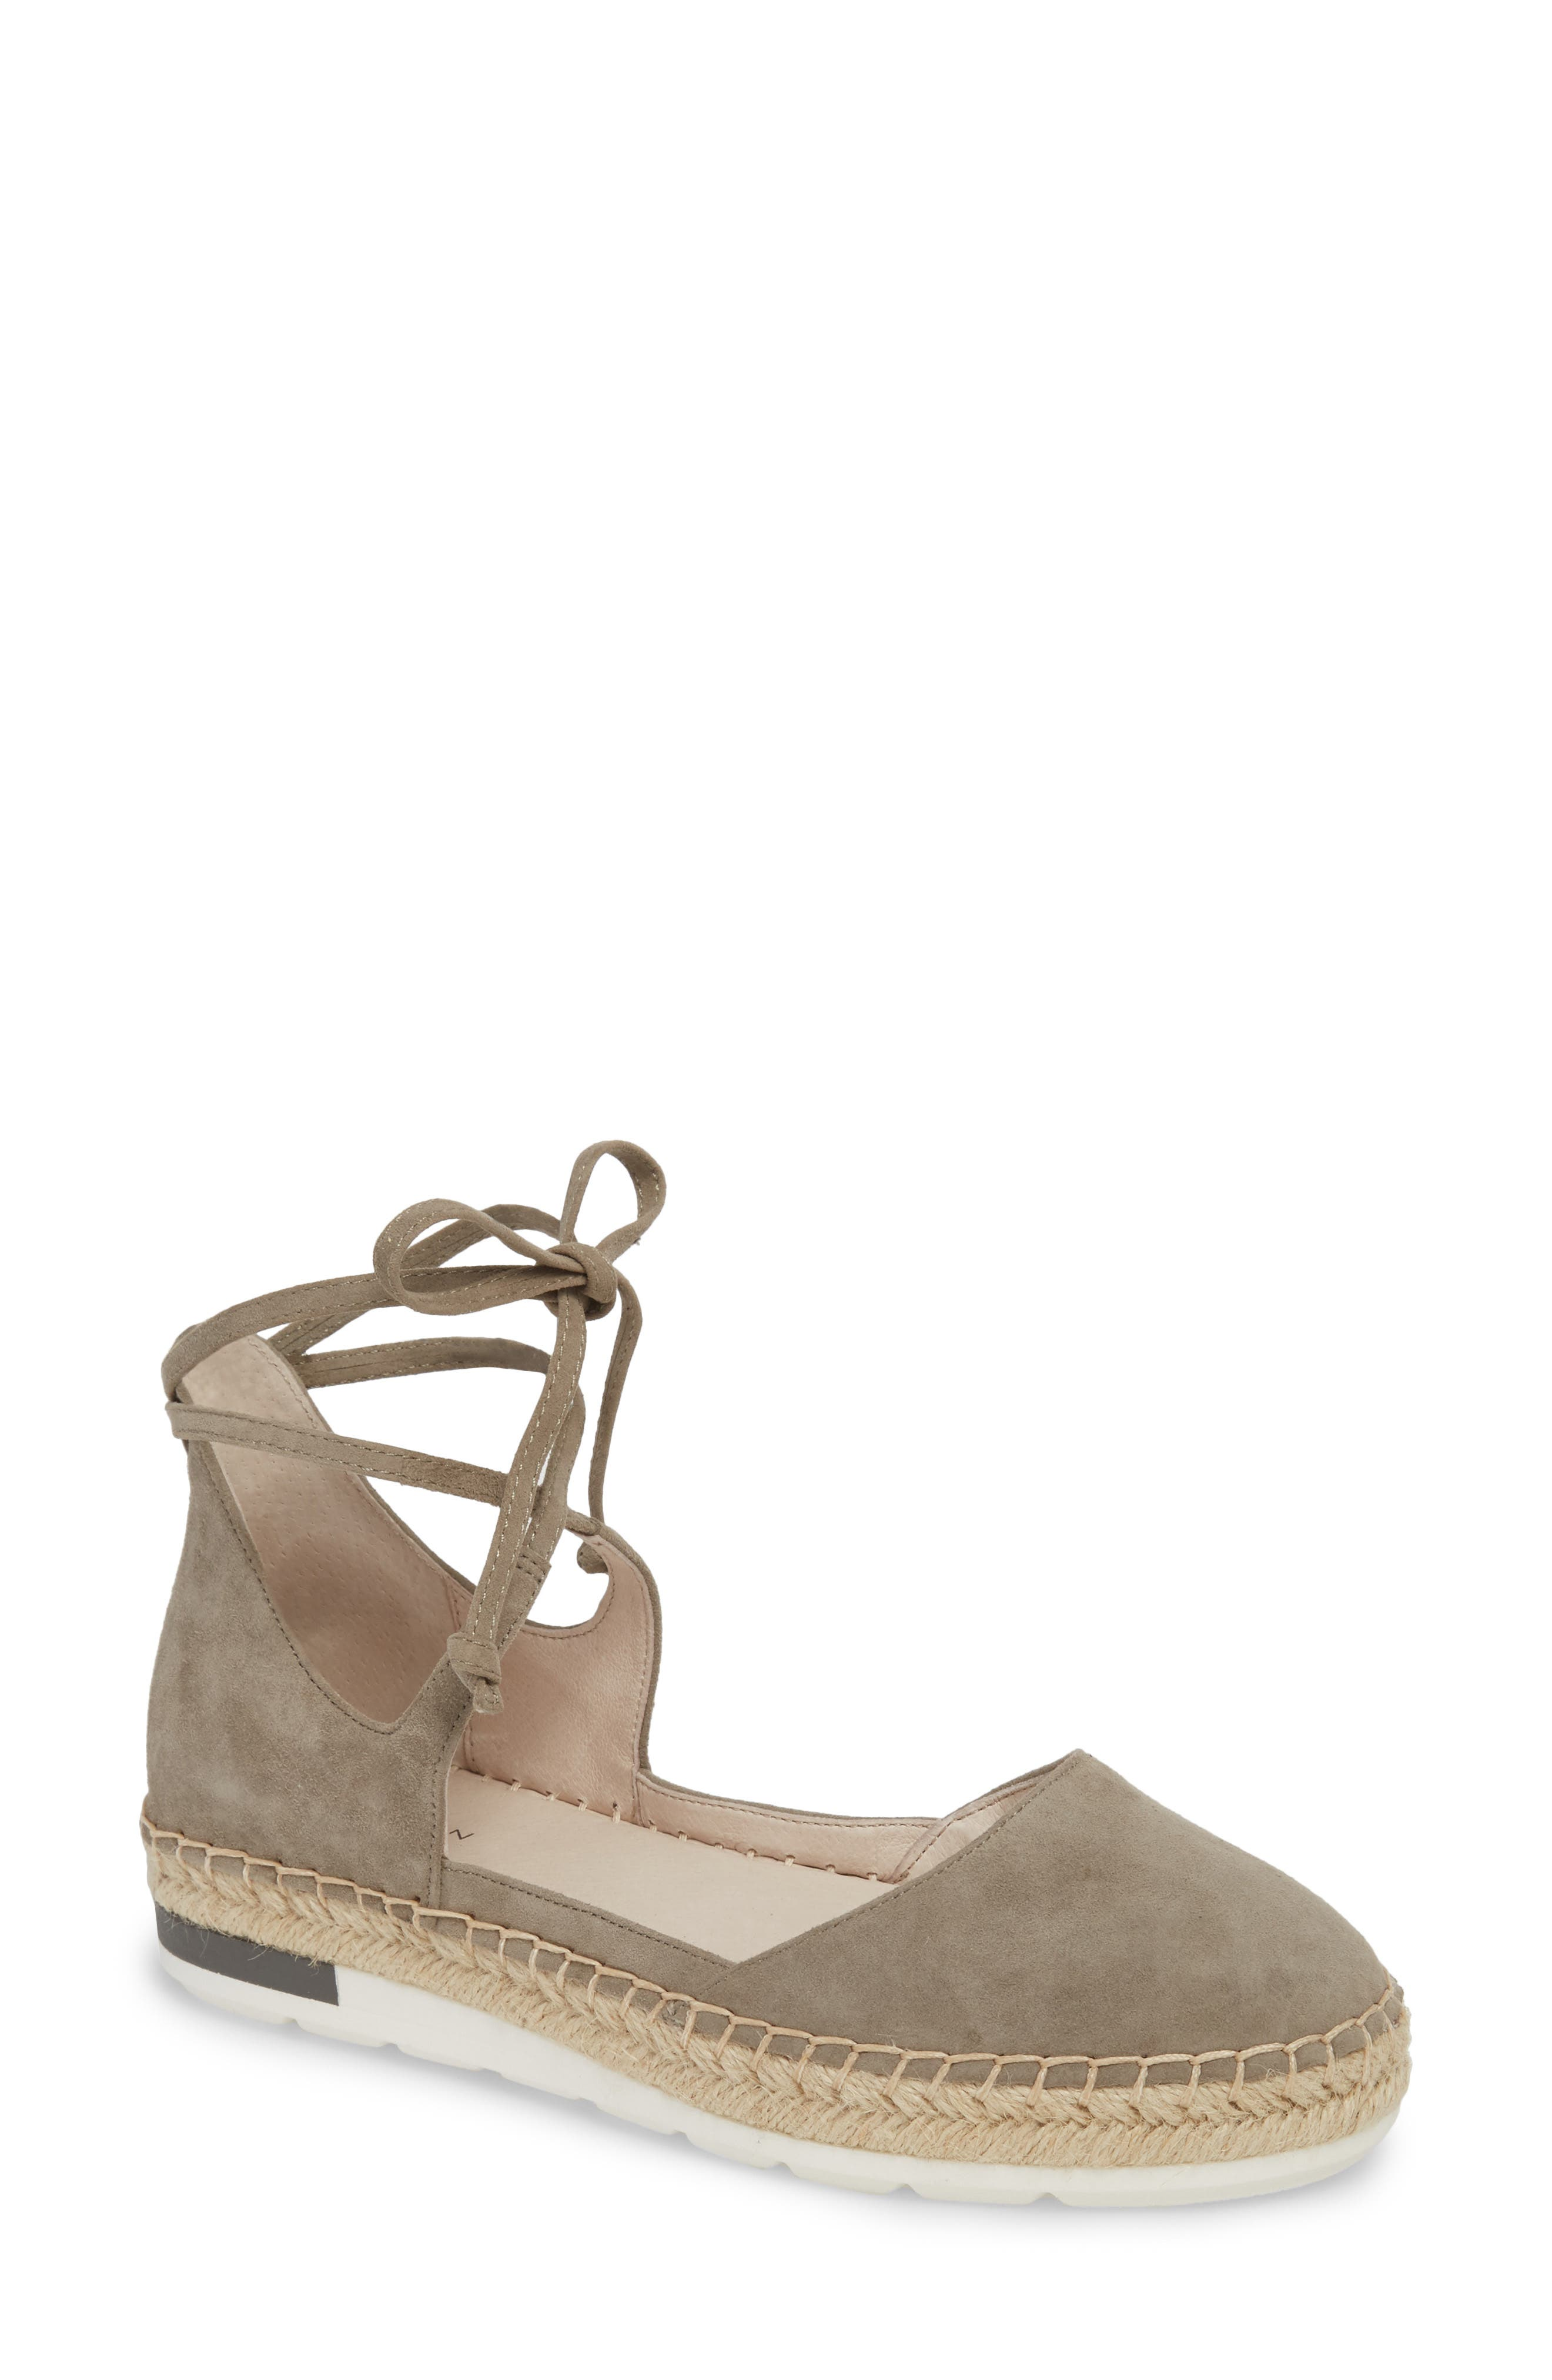 Leena Ankle Strap Sandal,                             Main thumbnail 1, color,                             030